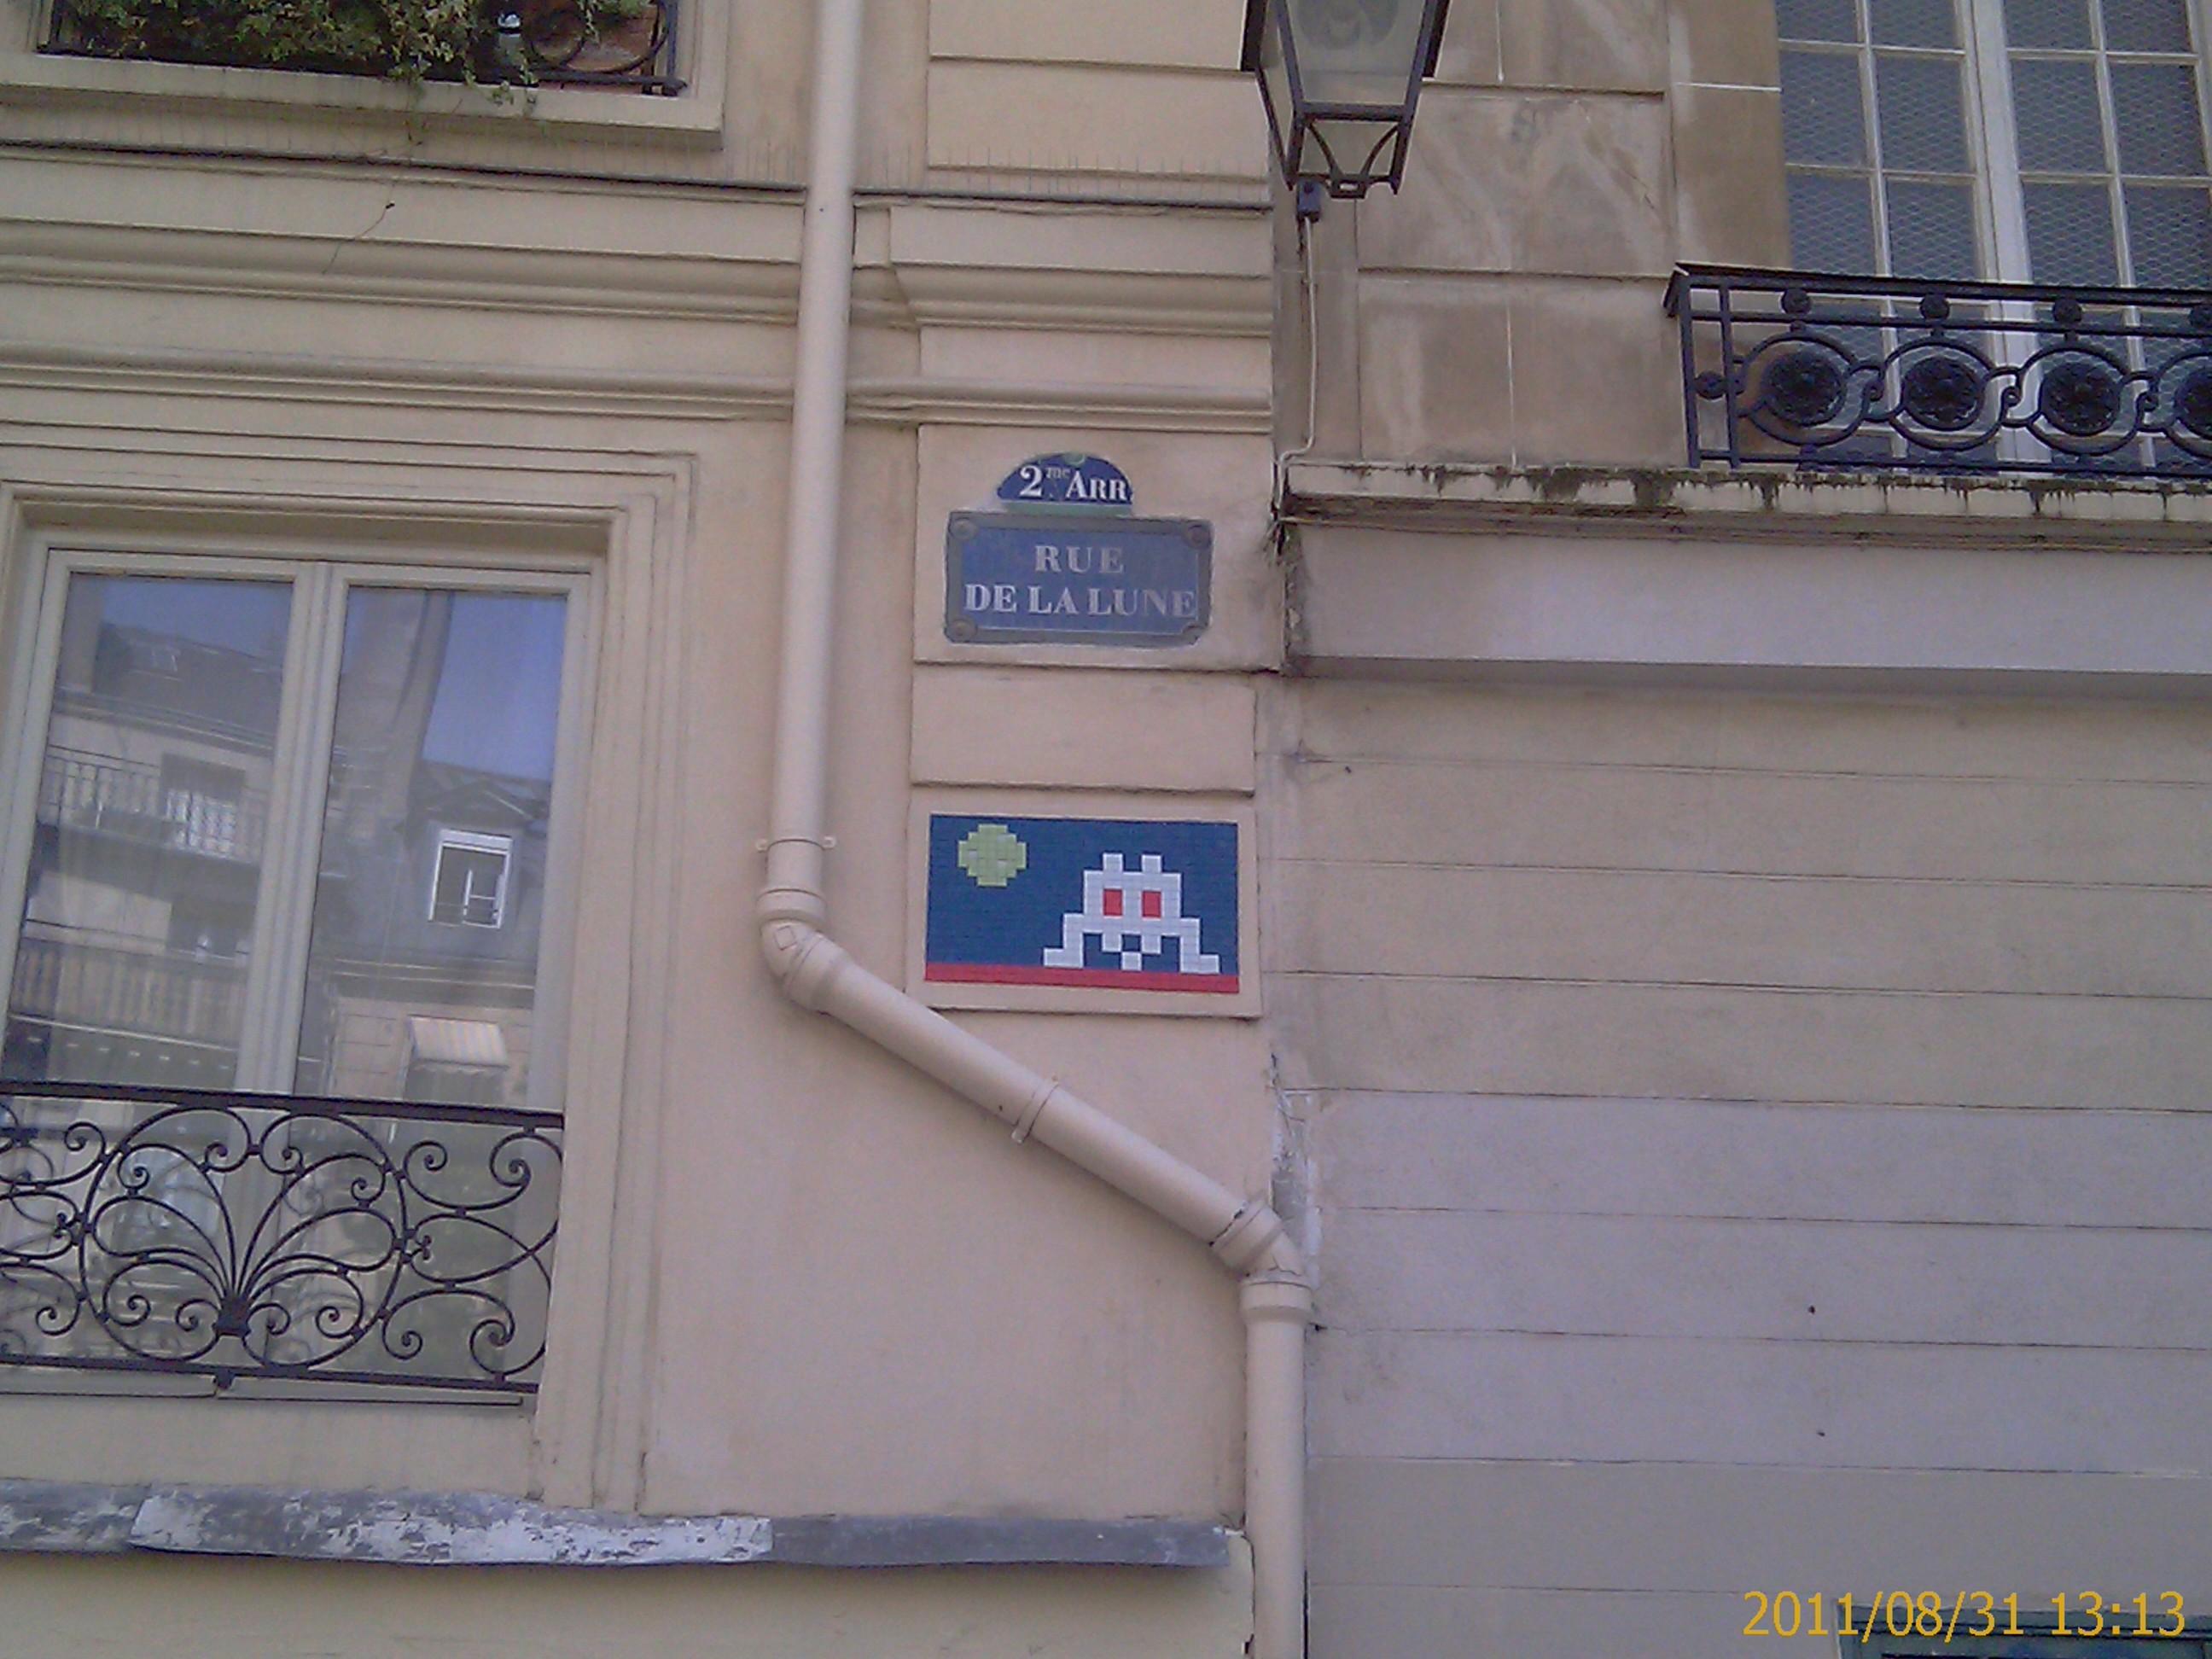 Rue de la Lune